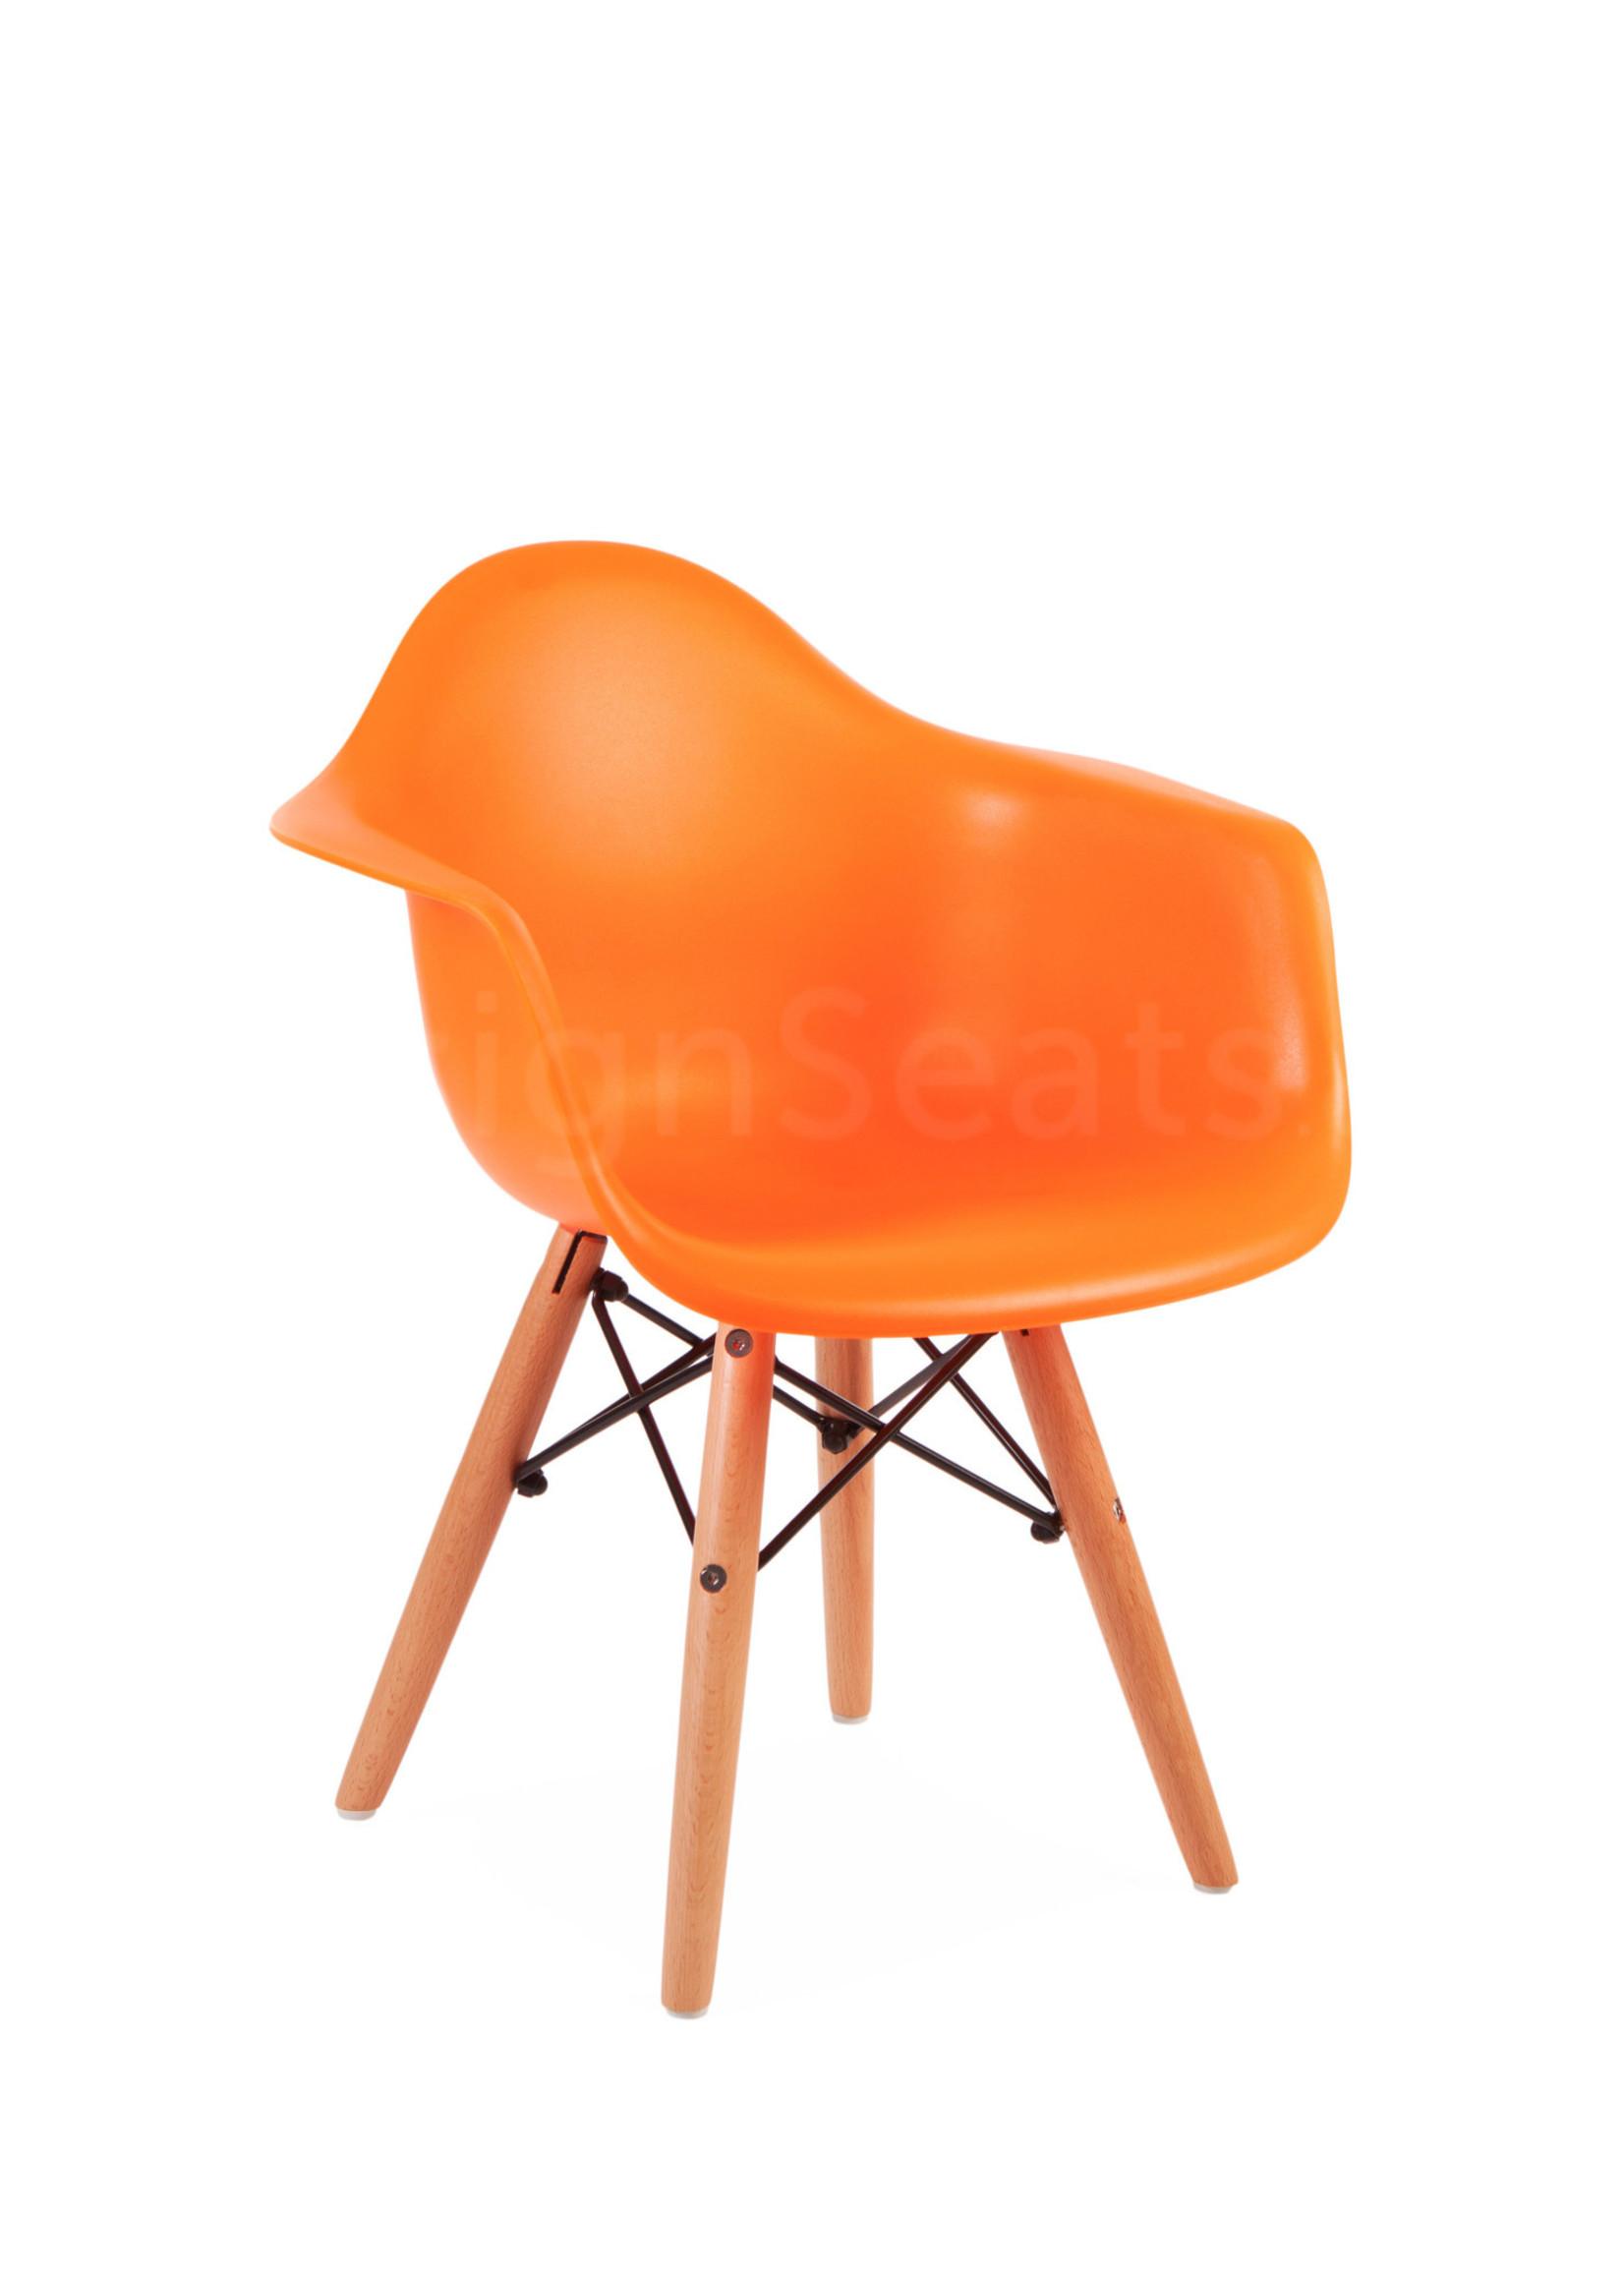 DAW Eames Kinderstoel Bright orange